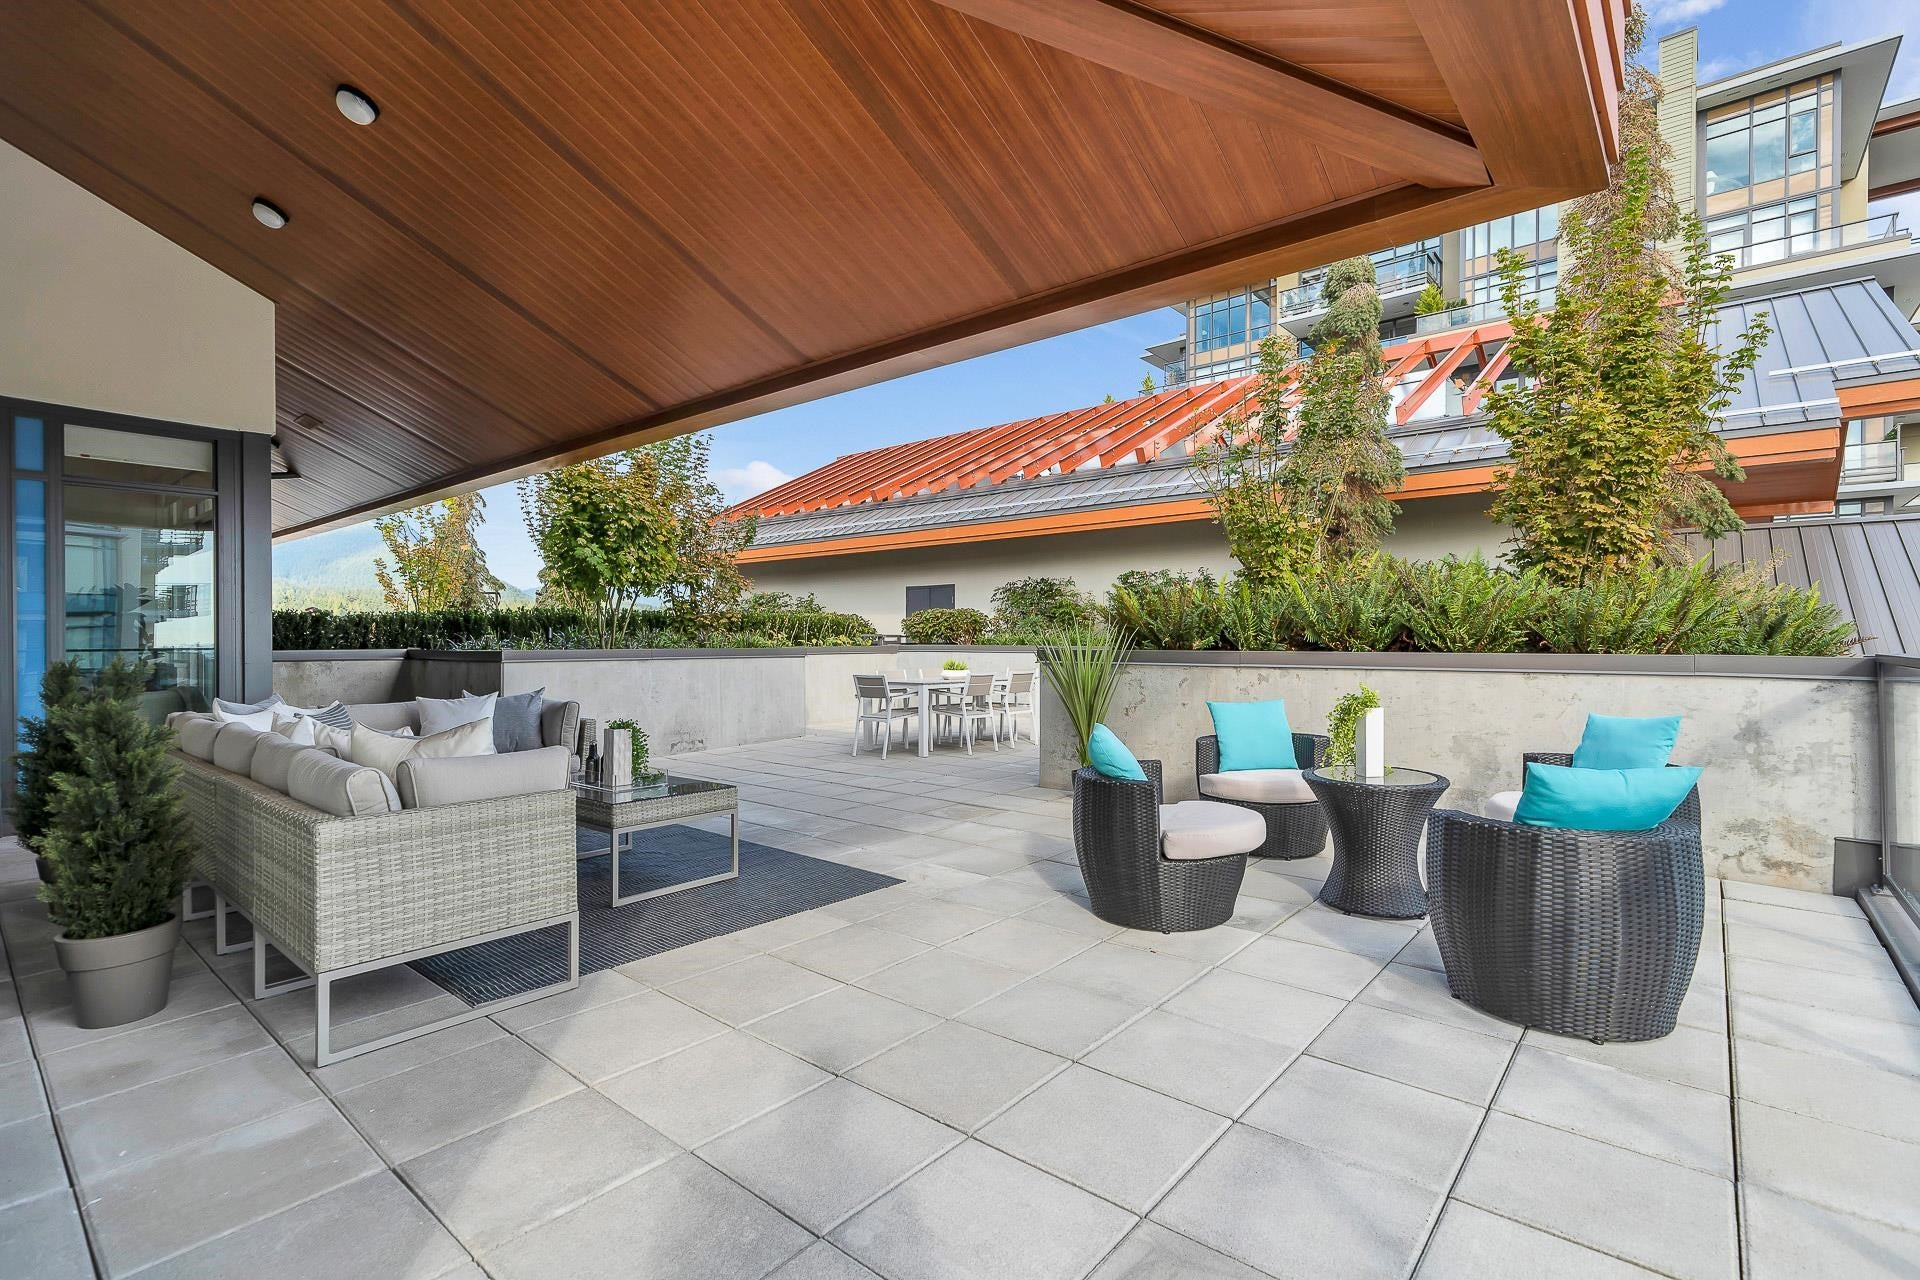 702 2780 VALLEY CENTRE AVENUE - Lynn Valley Apartment/Condo for sale, 3 Bedrooms (R2622279) - #25